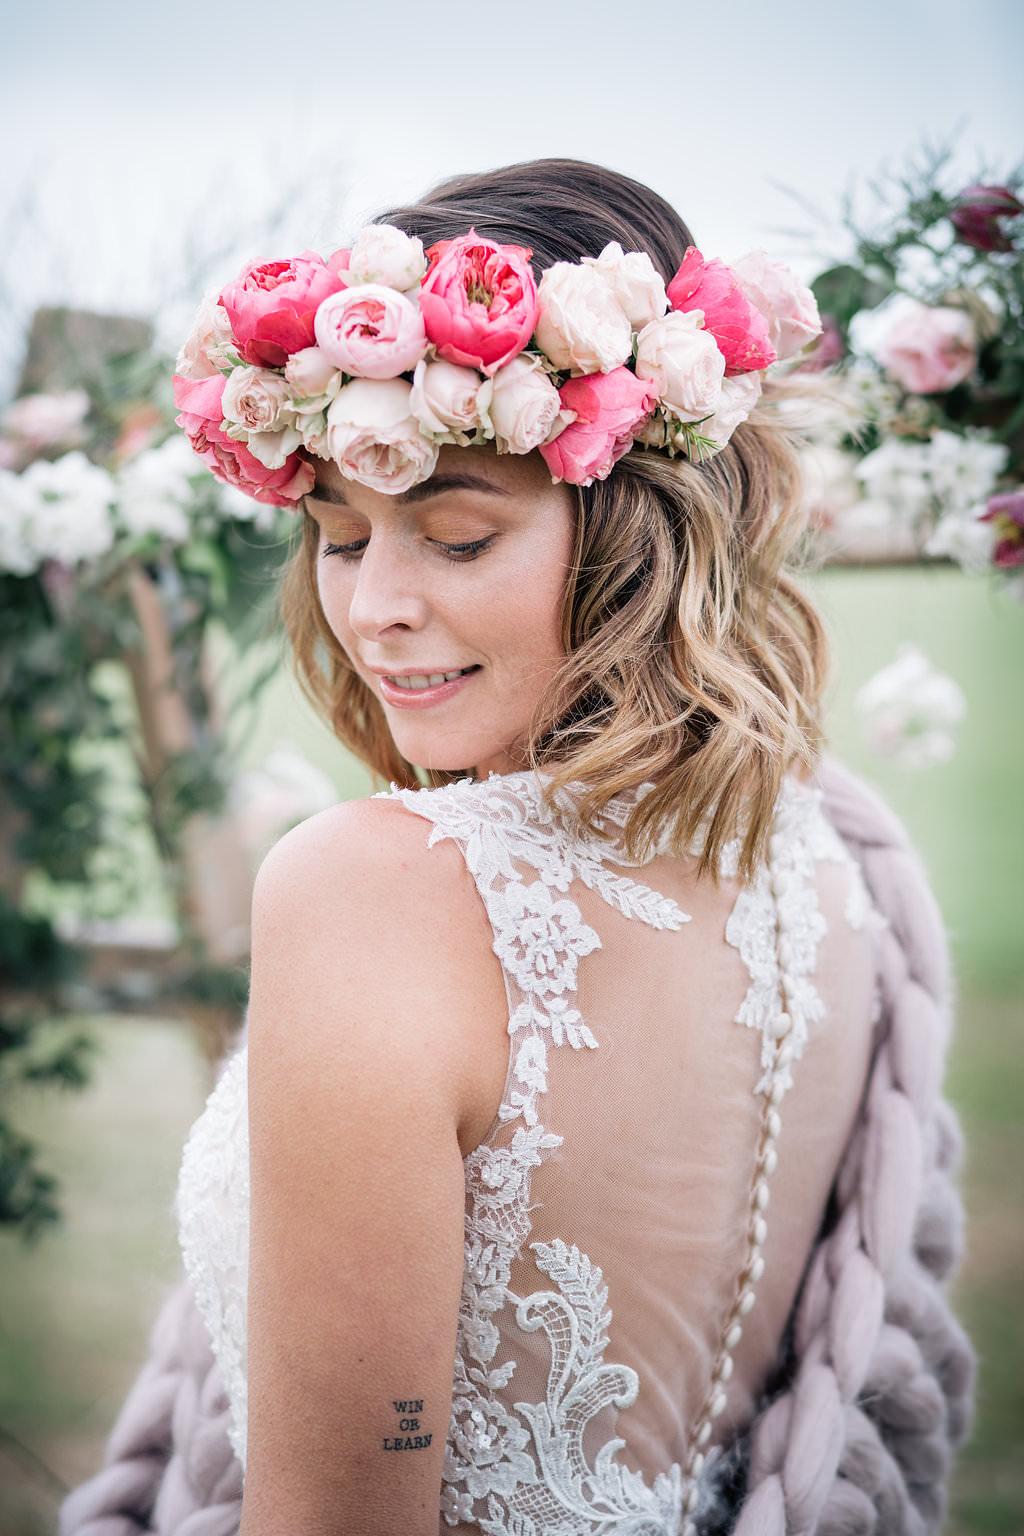 Bride Bridal Hair Style Short Bob Flower Crown Lapstone Barn Wedding Ideas Cotswolds Katie Hamilton Photography